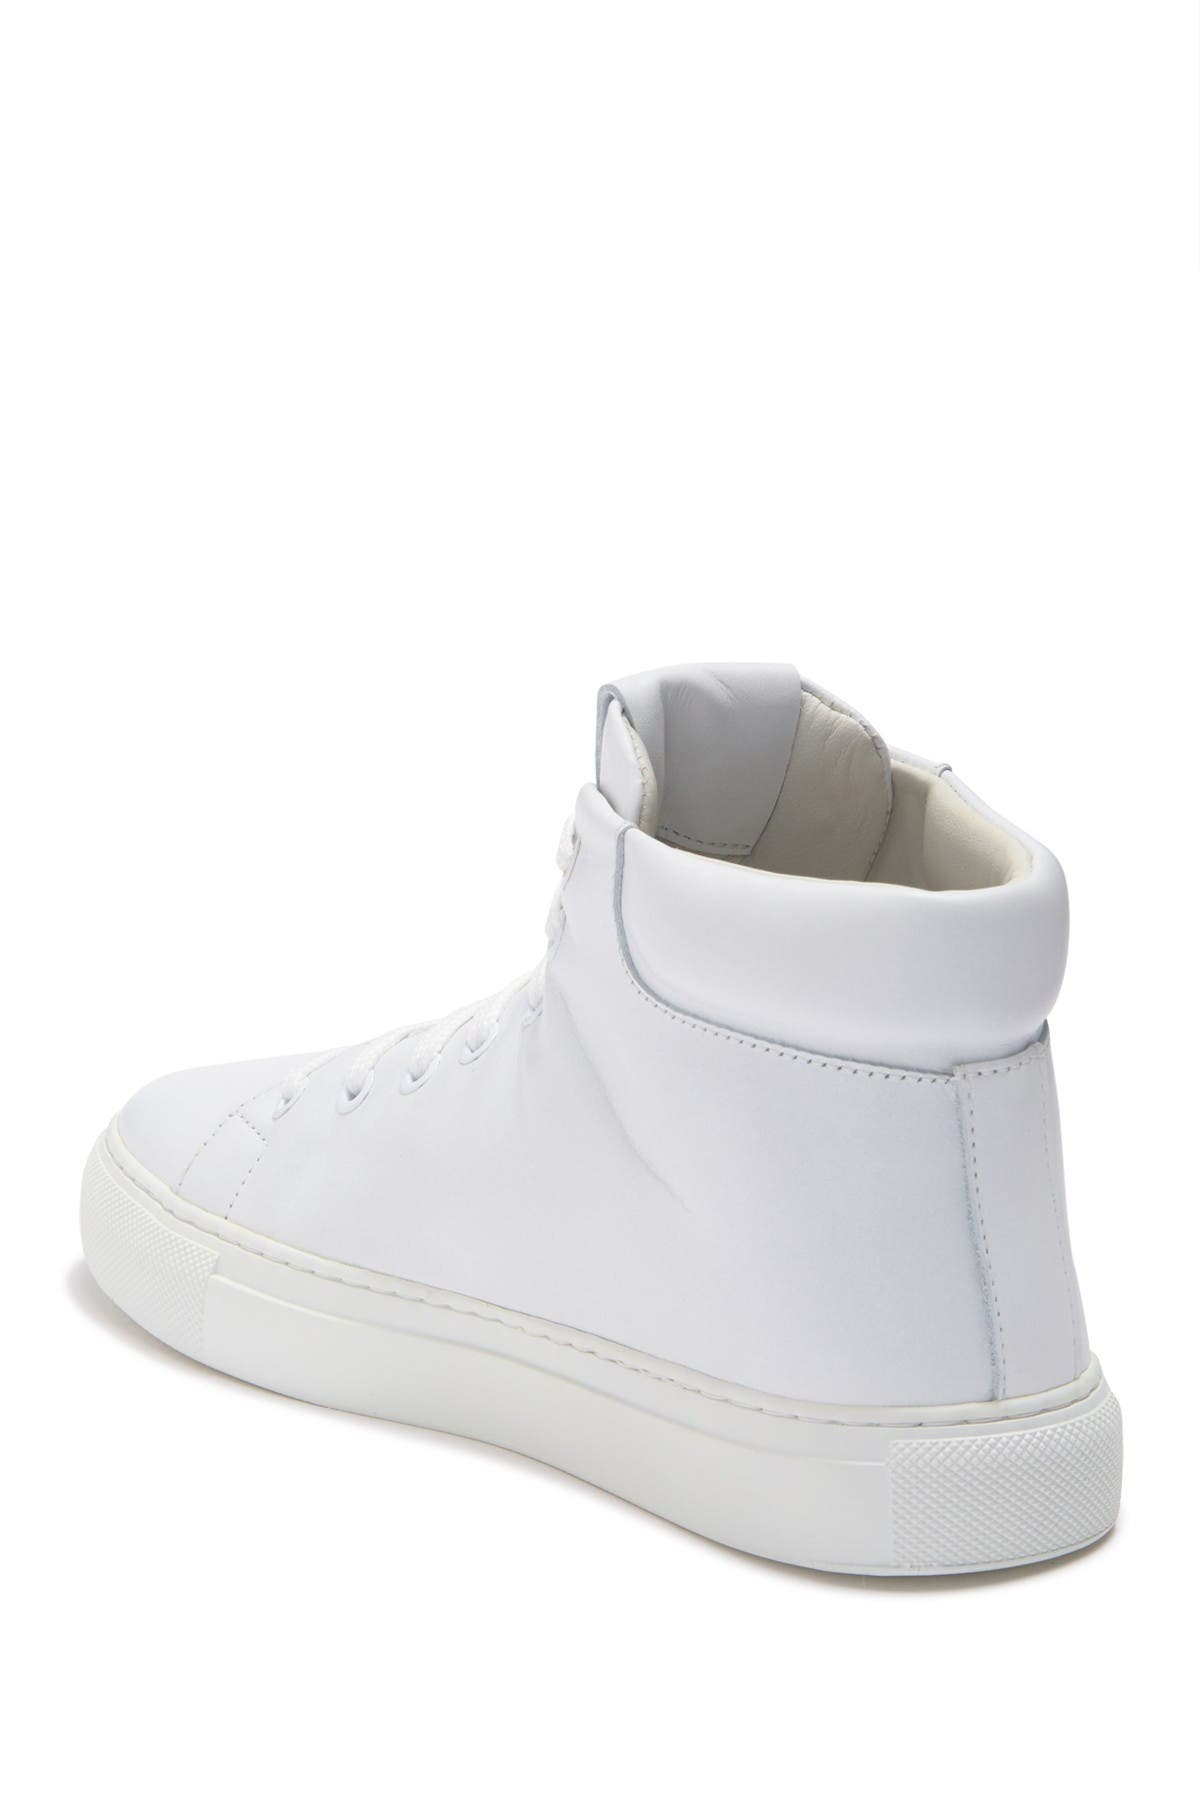 Image of MOSCHINO Logo Print High Top Sneaker